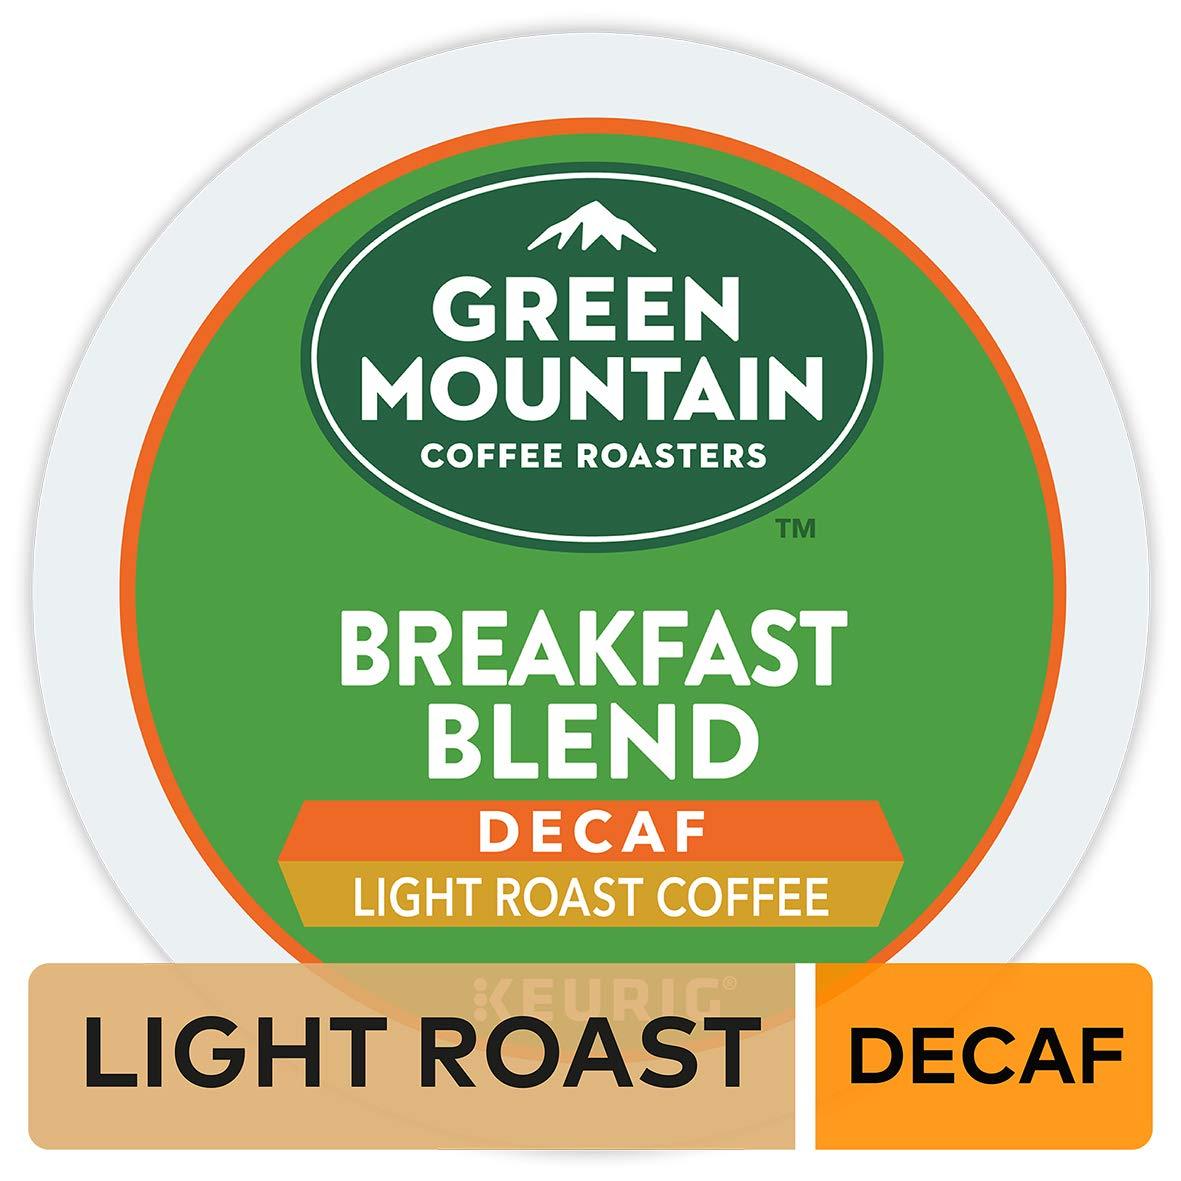 Green Mountain Coffee Roasters Breakfast Blend Decaf, Single Serve Coffee K-Cup Pod, Light Roast, 72 by GMCR Regulars (Image #1)